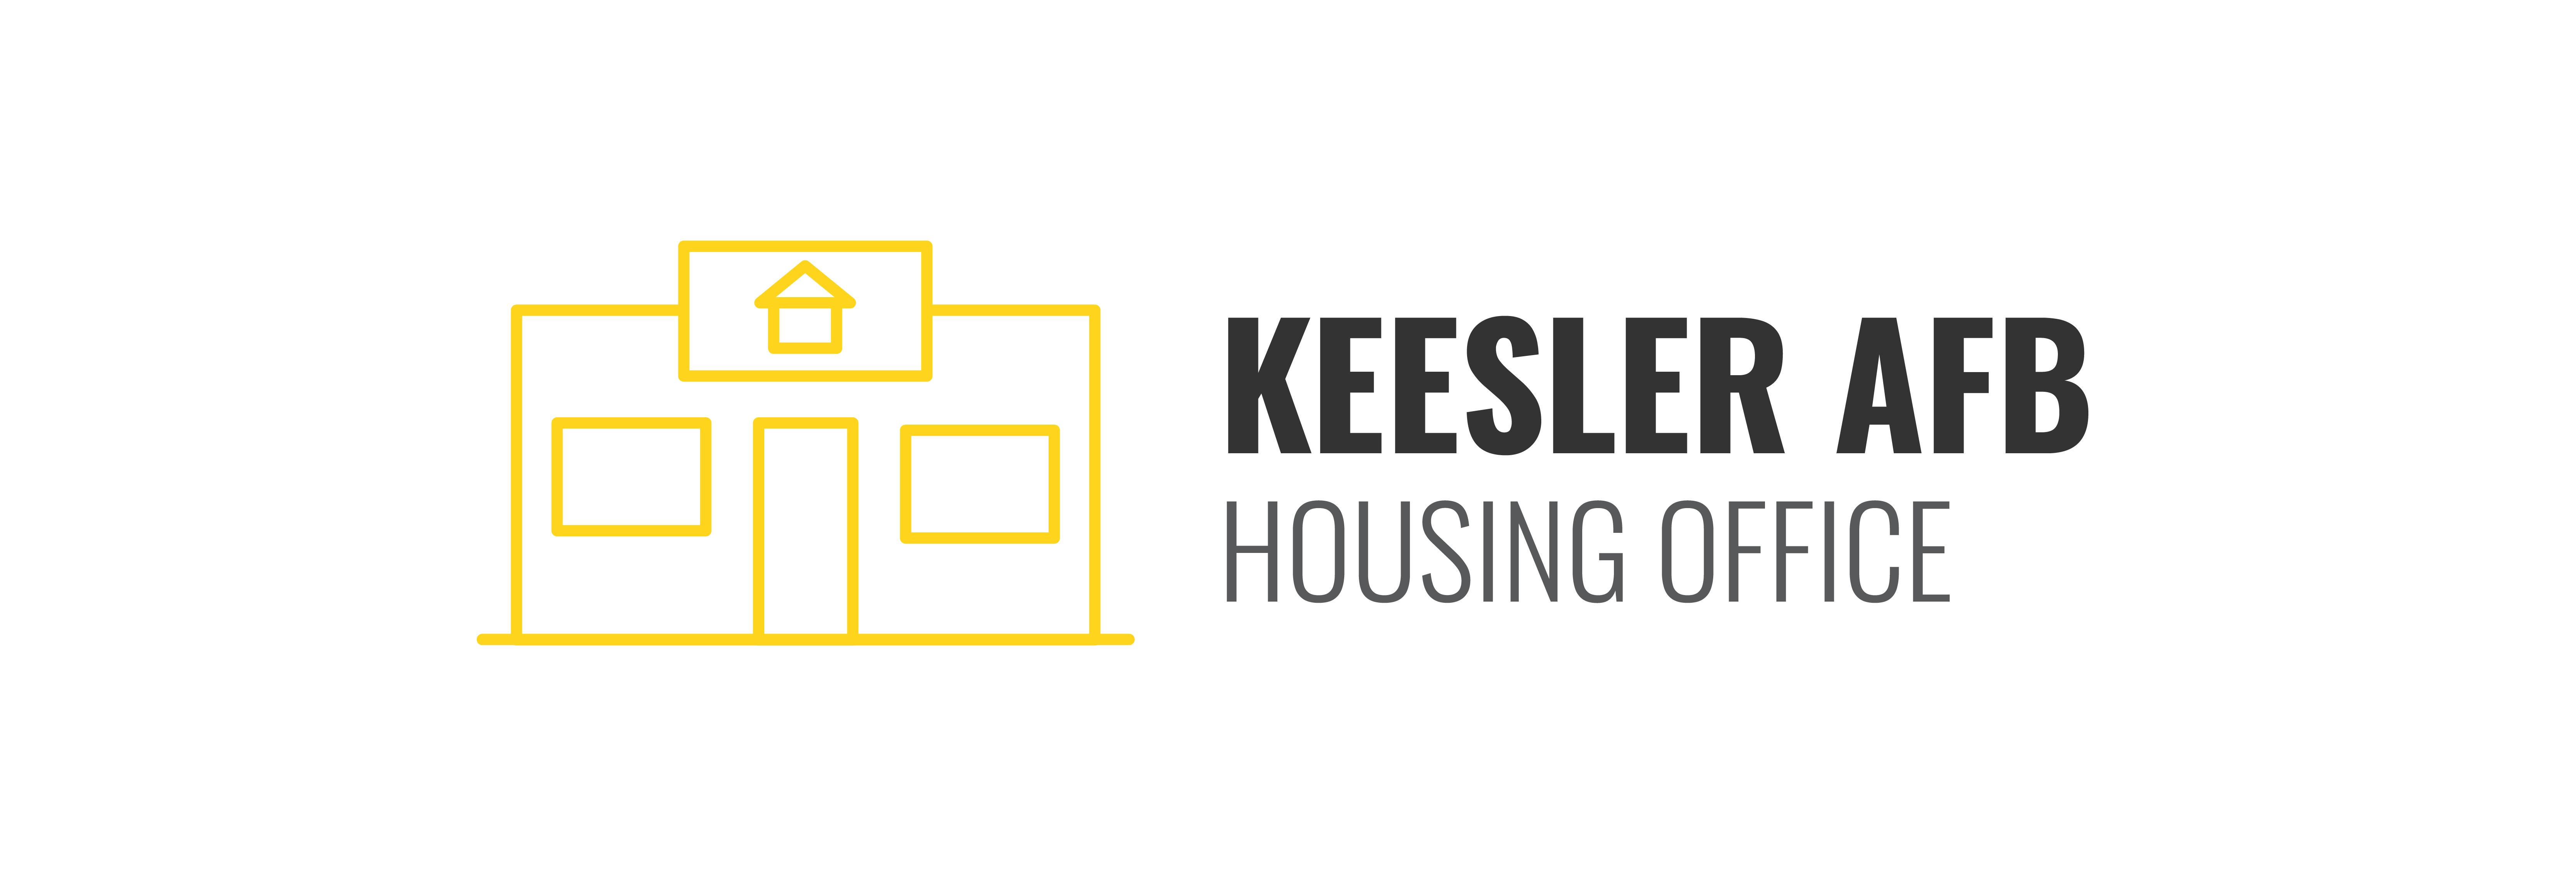 Keesler AFB Housing Office